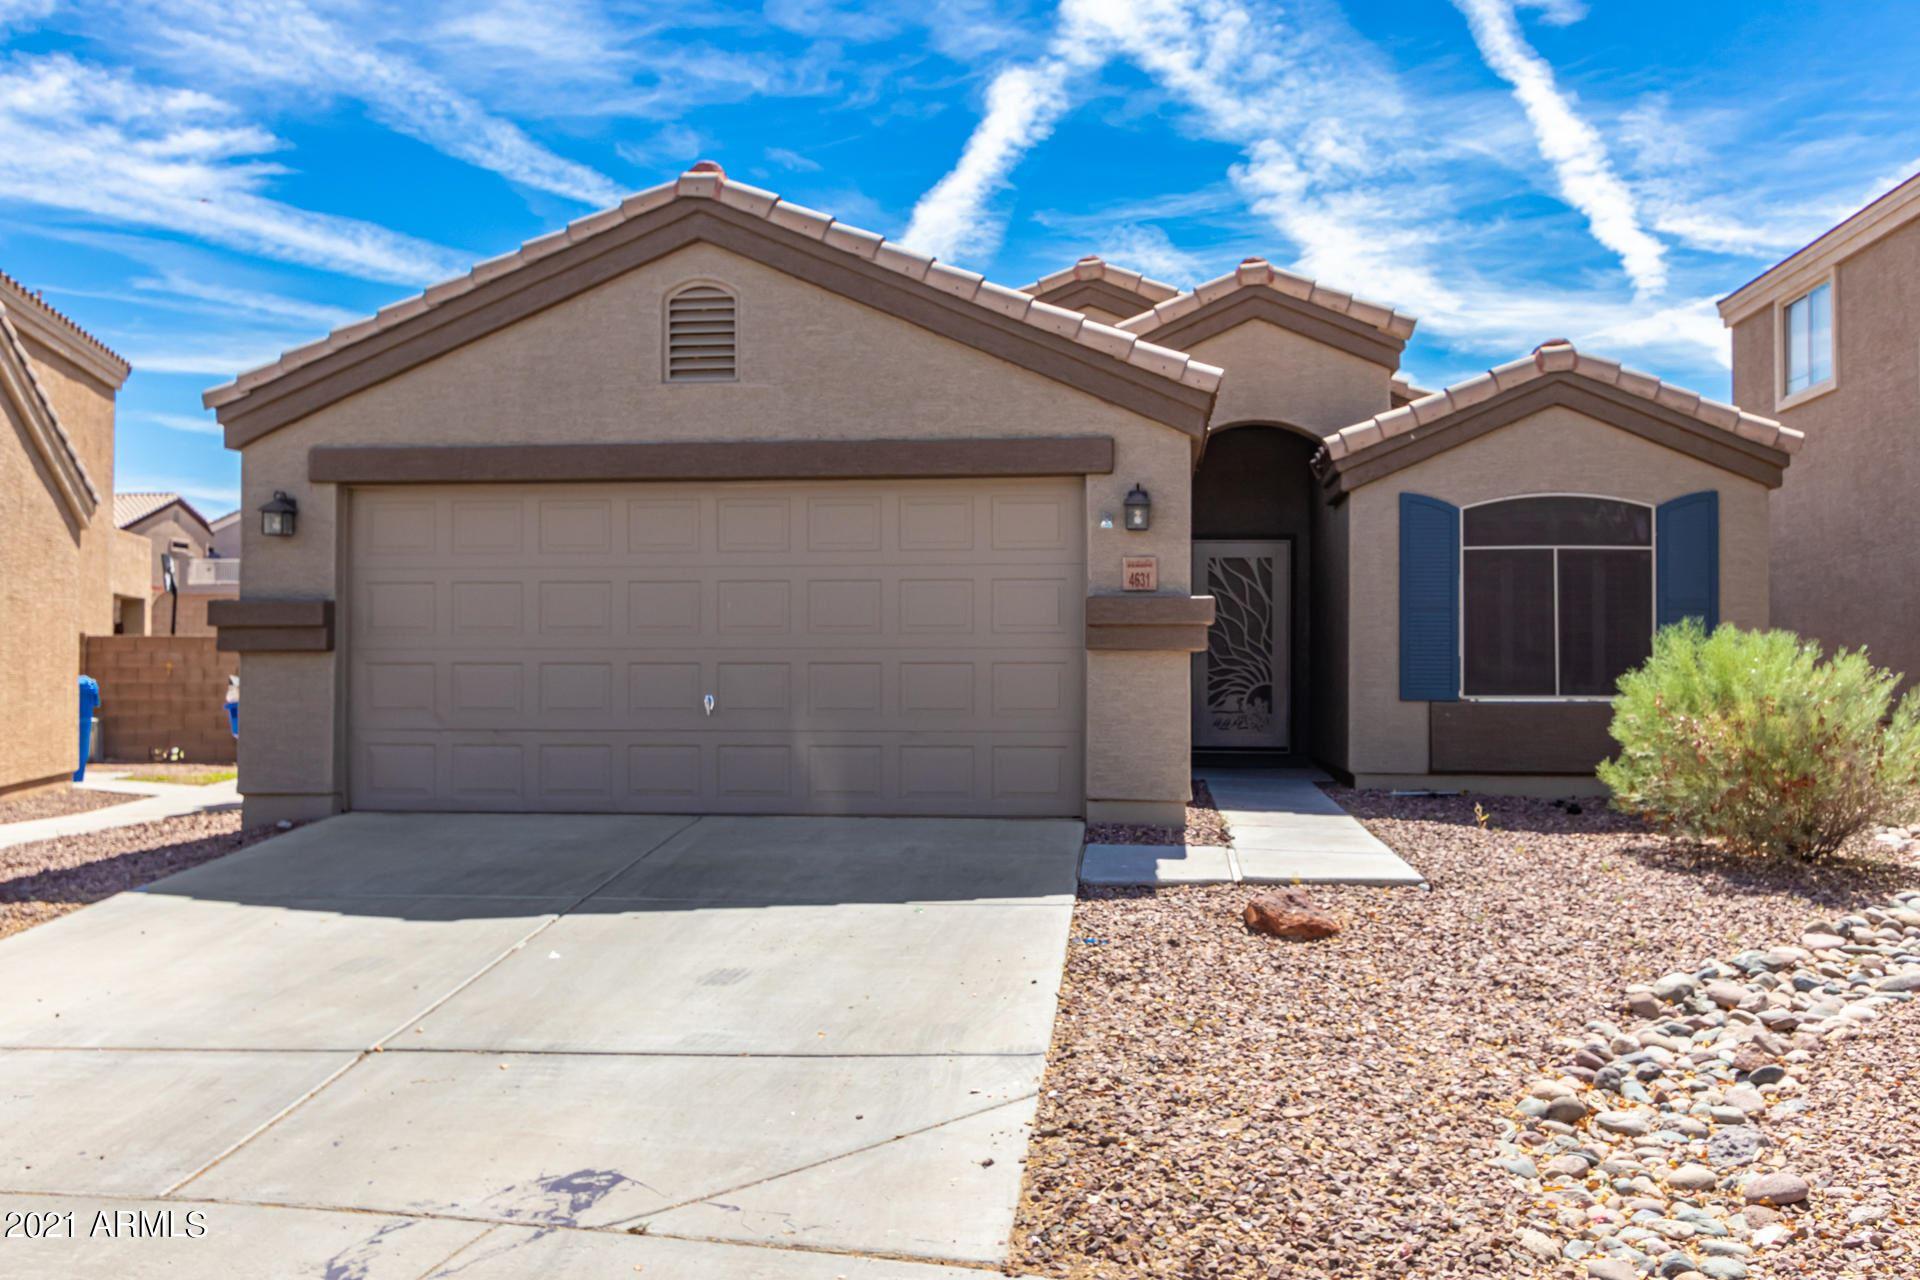 Photo of 4631 N 108TH Drive N, Phoenix, AZ 85037 (MLS # 6249878)